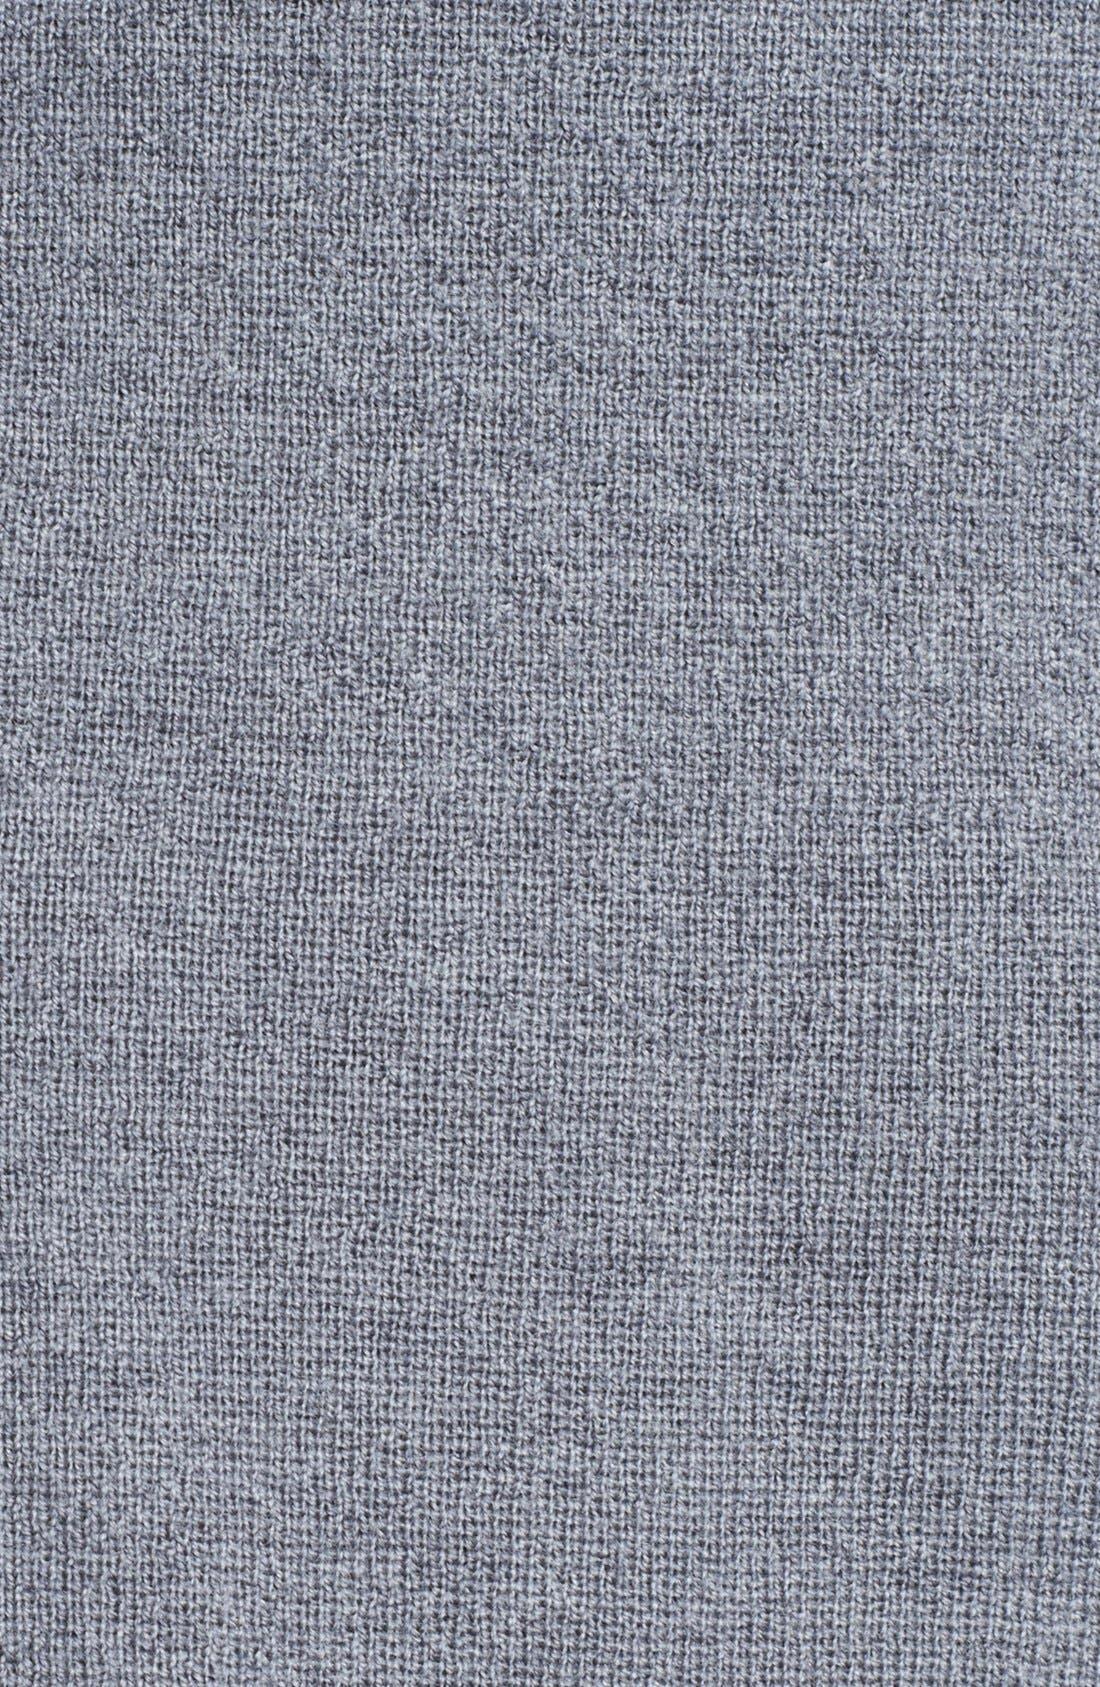 Alternate Image 3  - Theory 'Adan' Wool Sweater